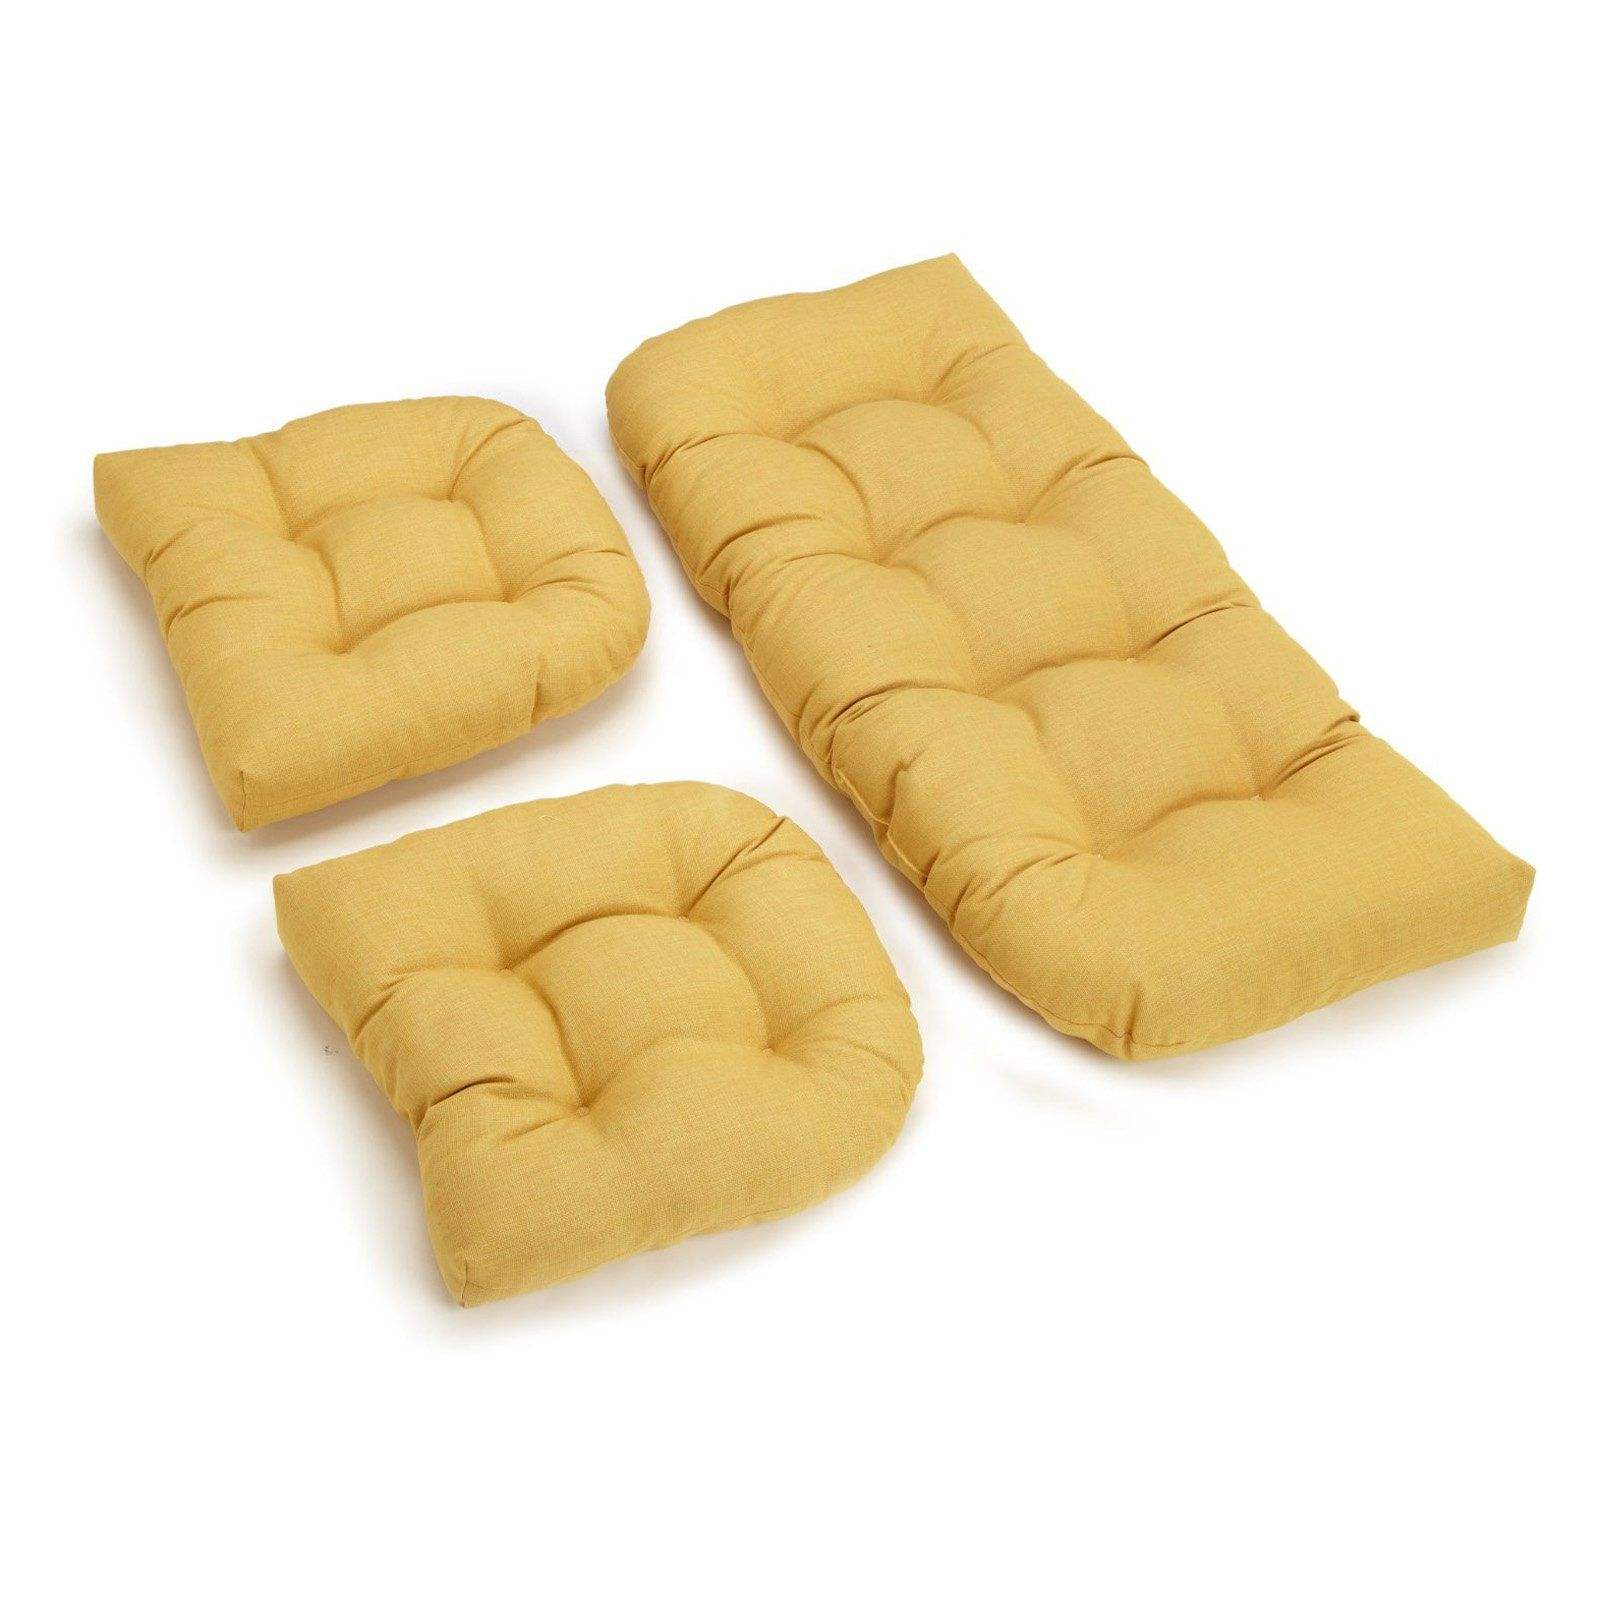 Blazing Needles Outdoor Wicker Settee Cushions Set of 3